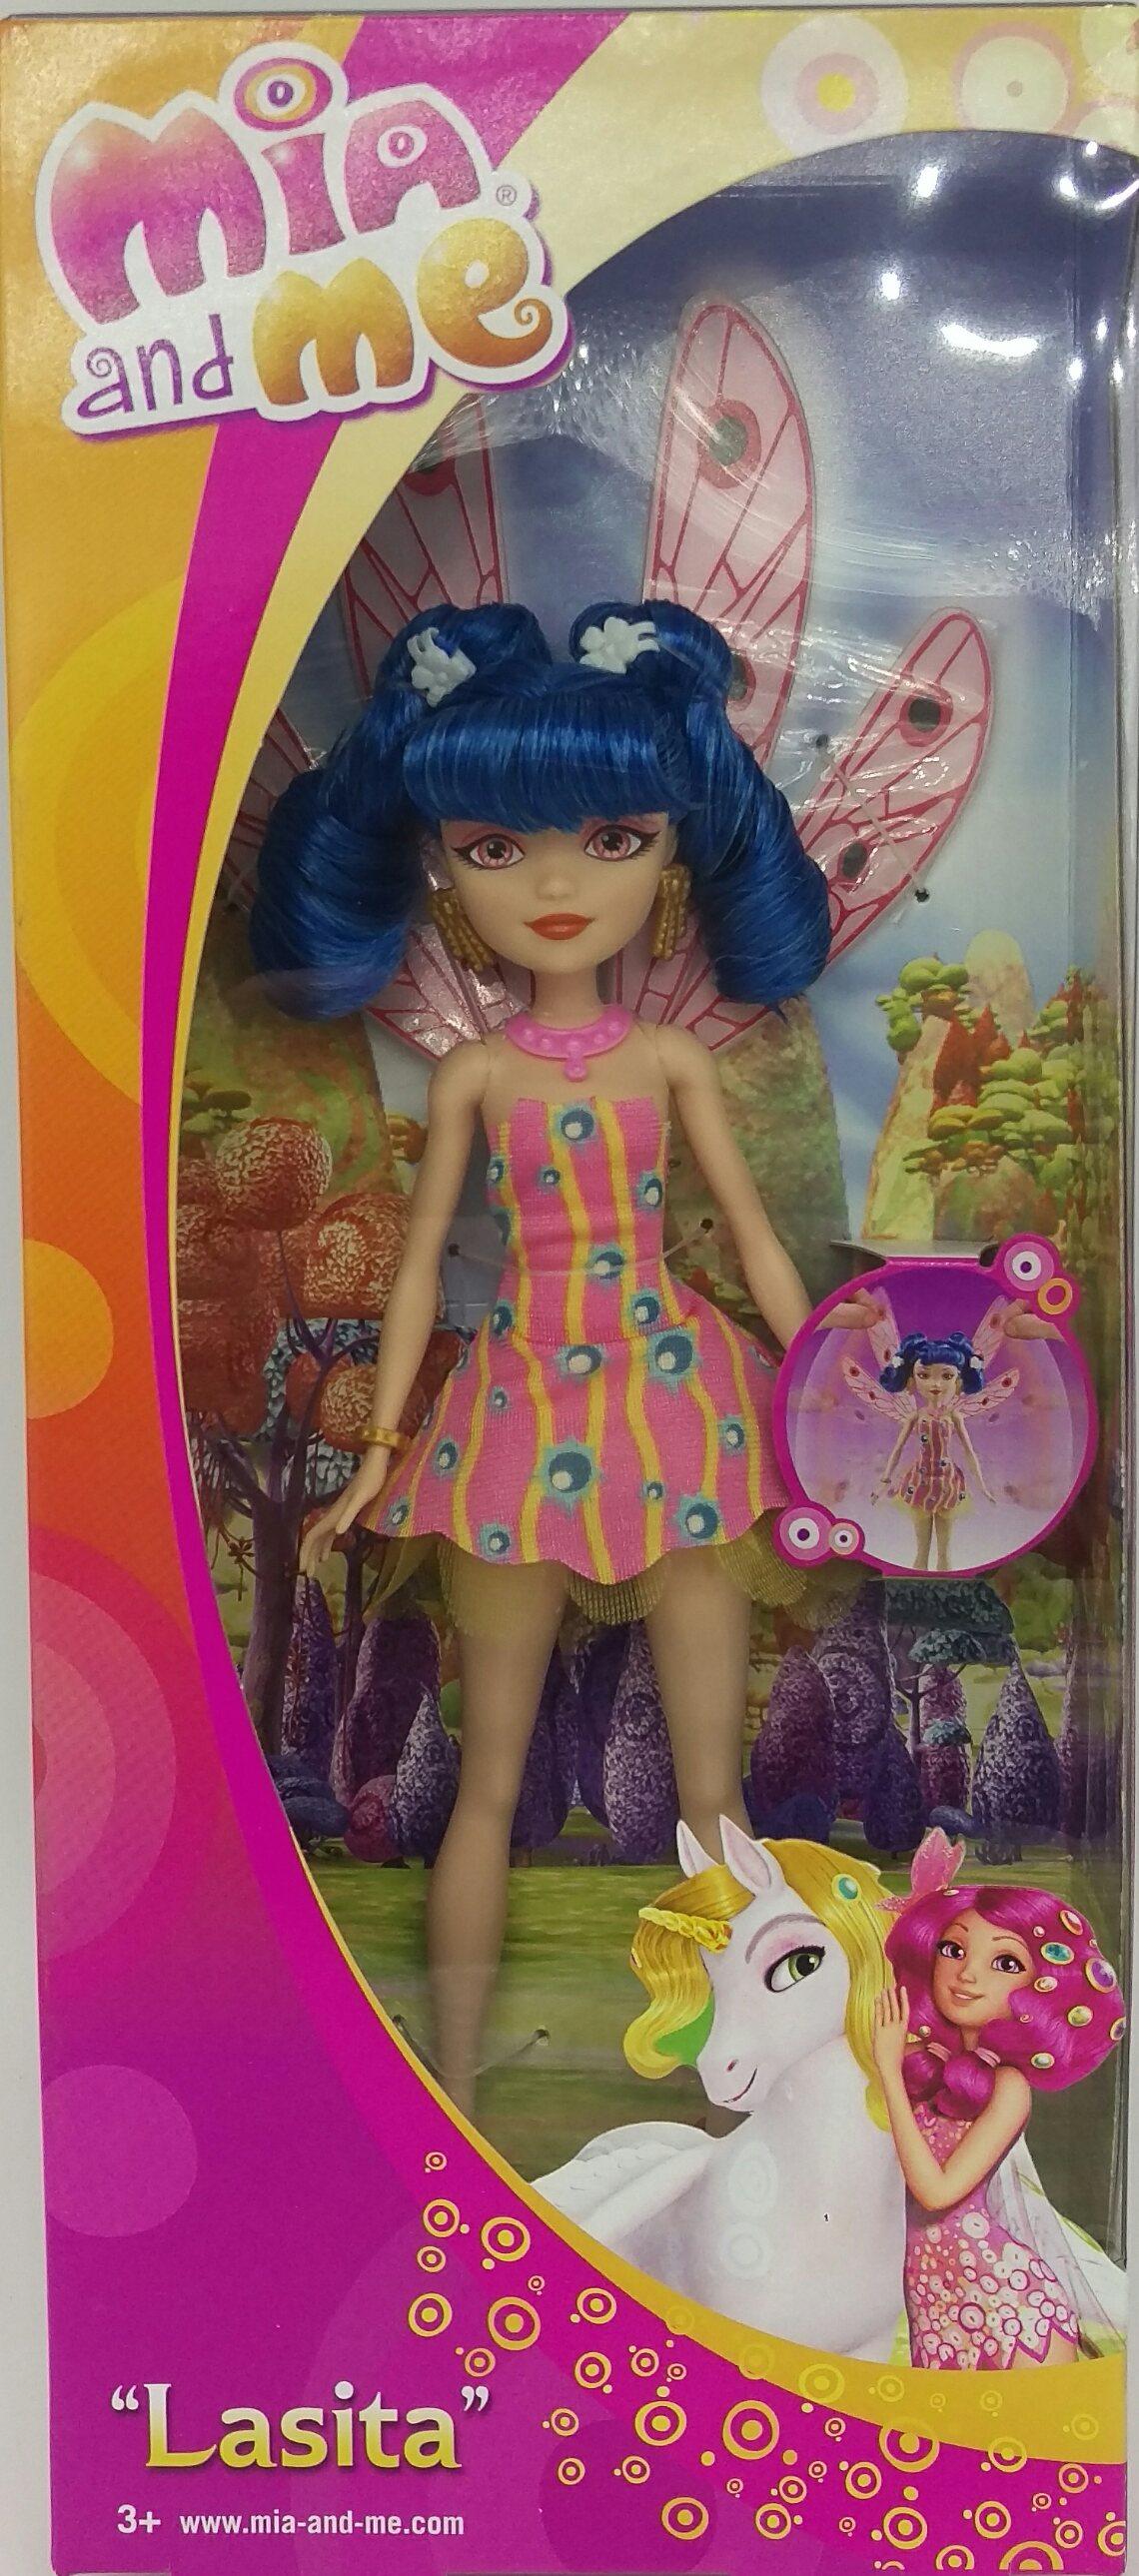 Mattel Mia and Me DHL66 - Modepuppen, Lasita Puppe